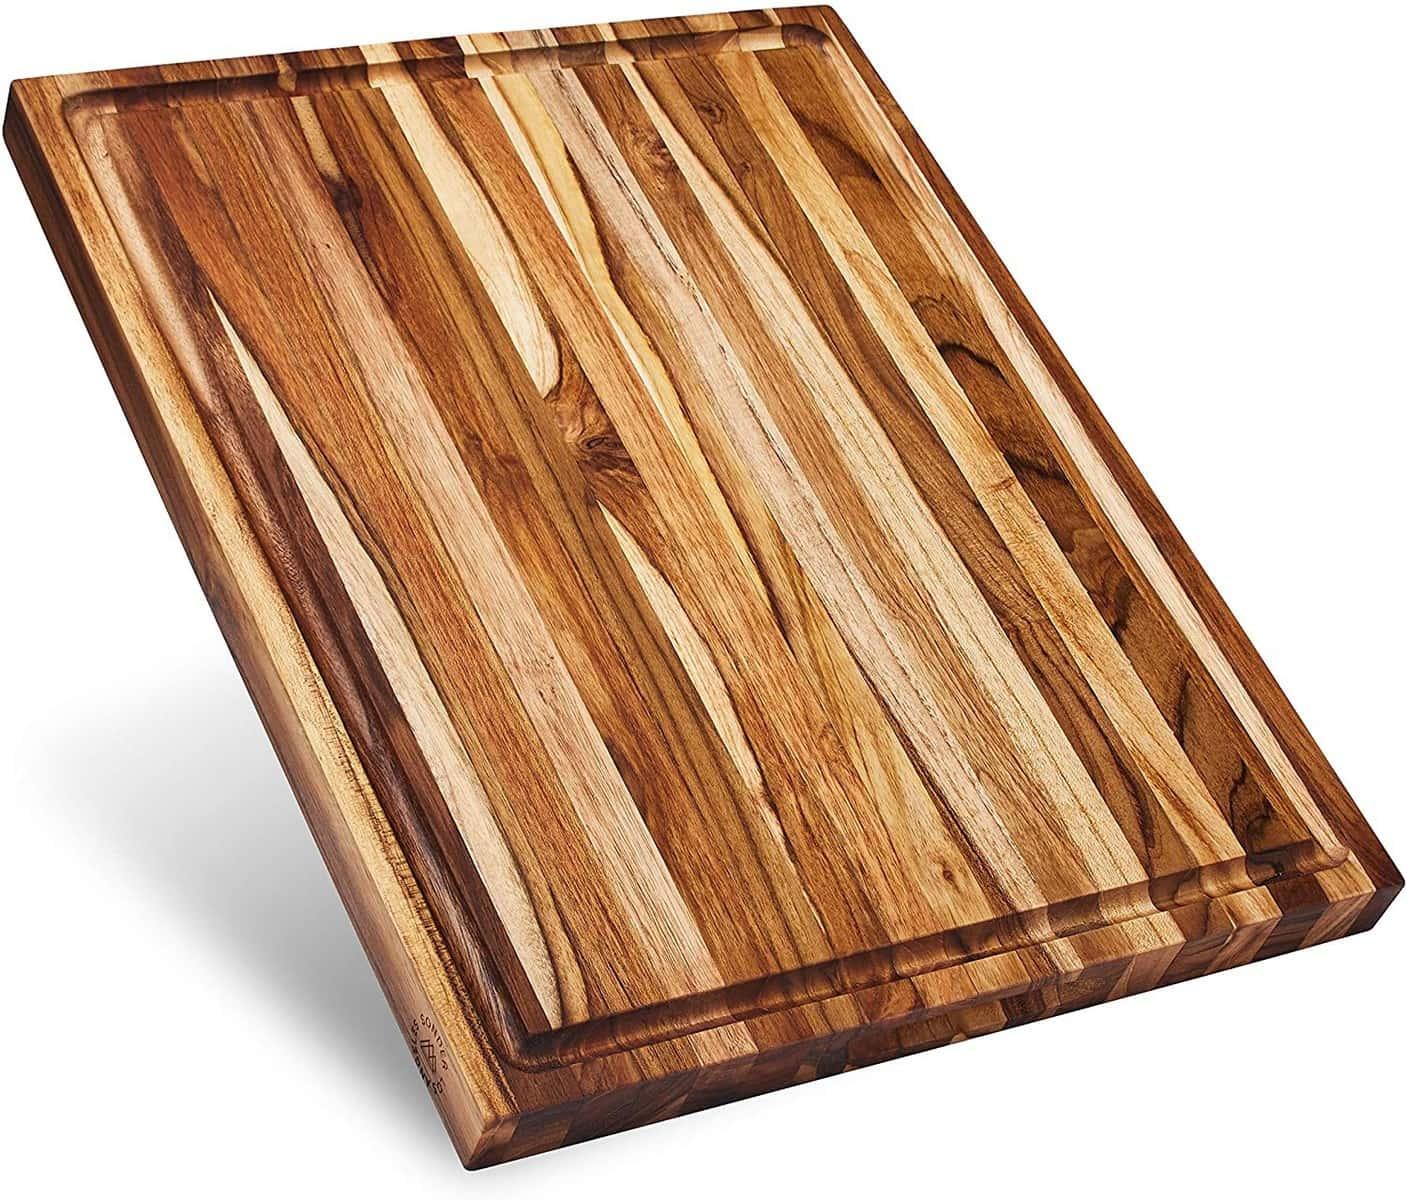 Sonder Los Angeles Teak Wood Cutting Board